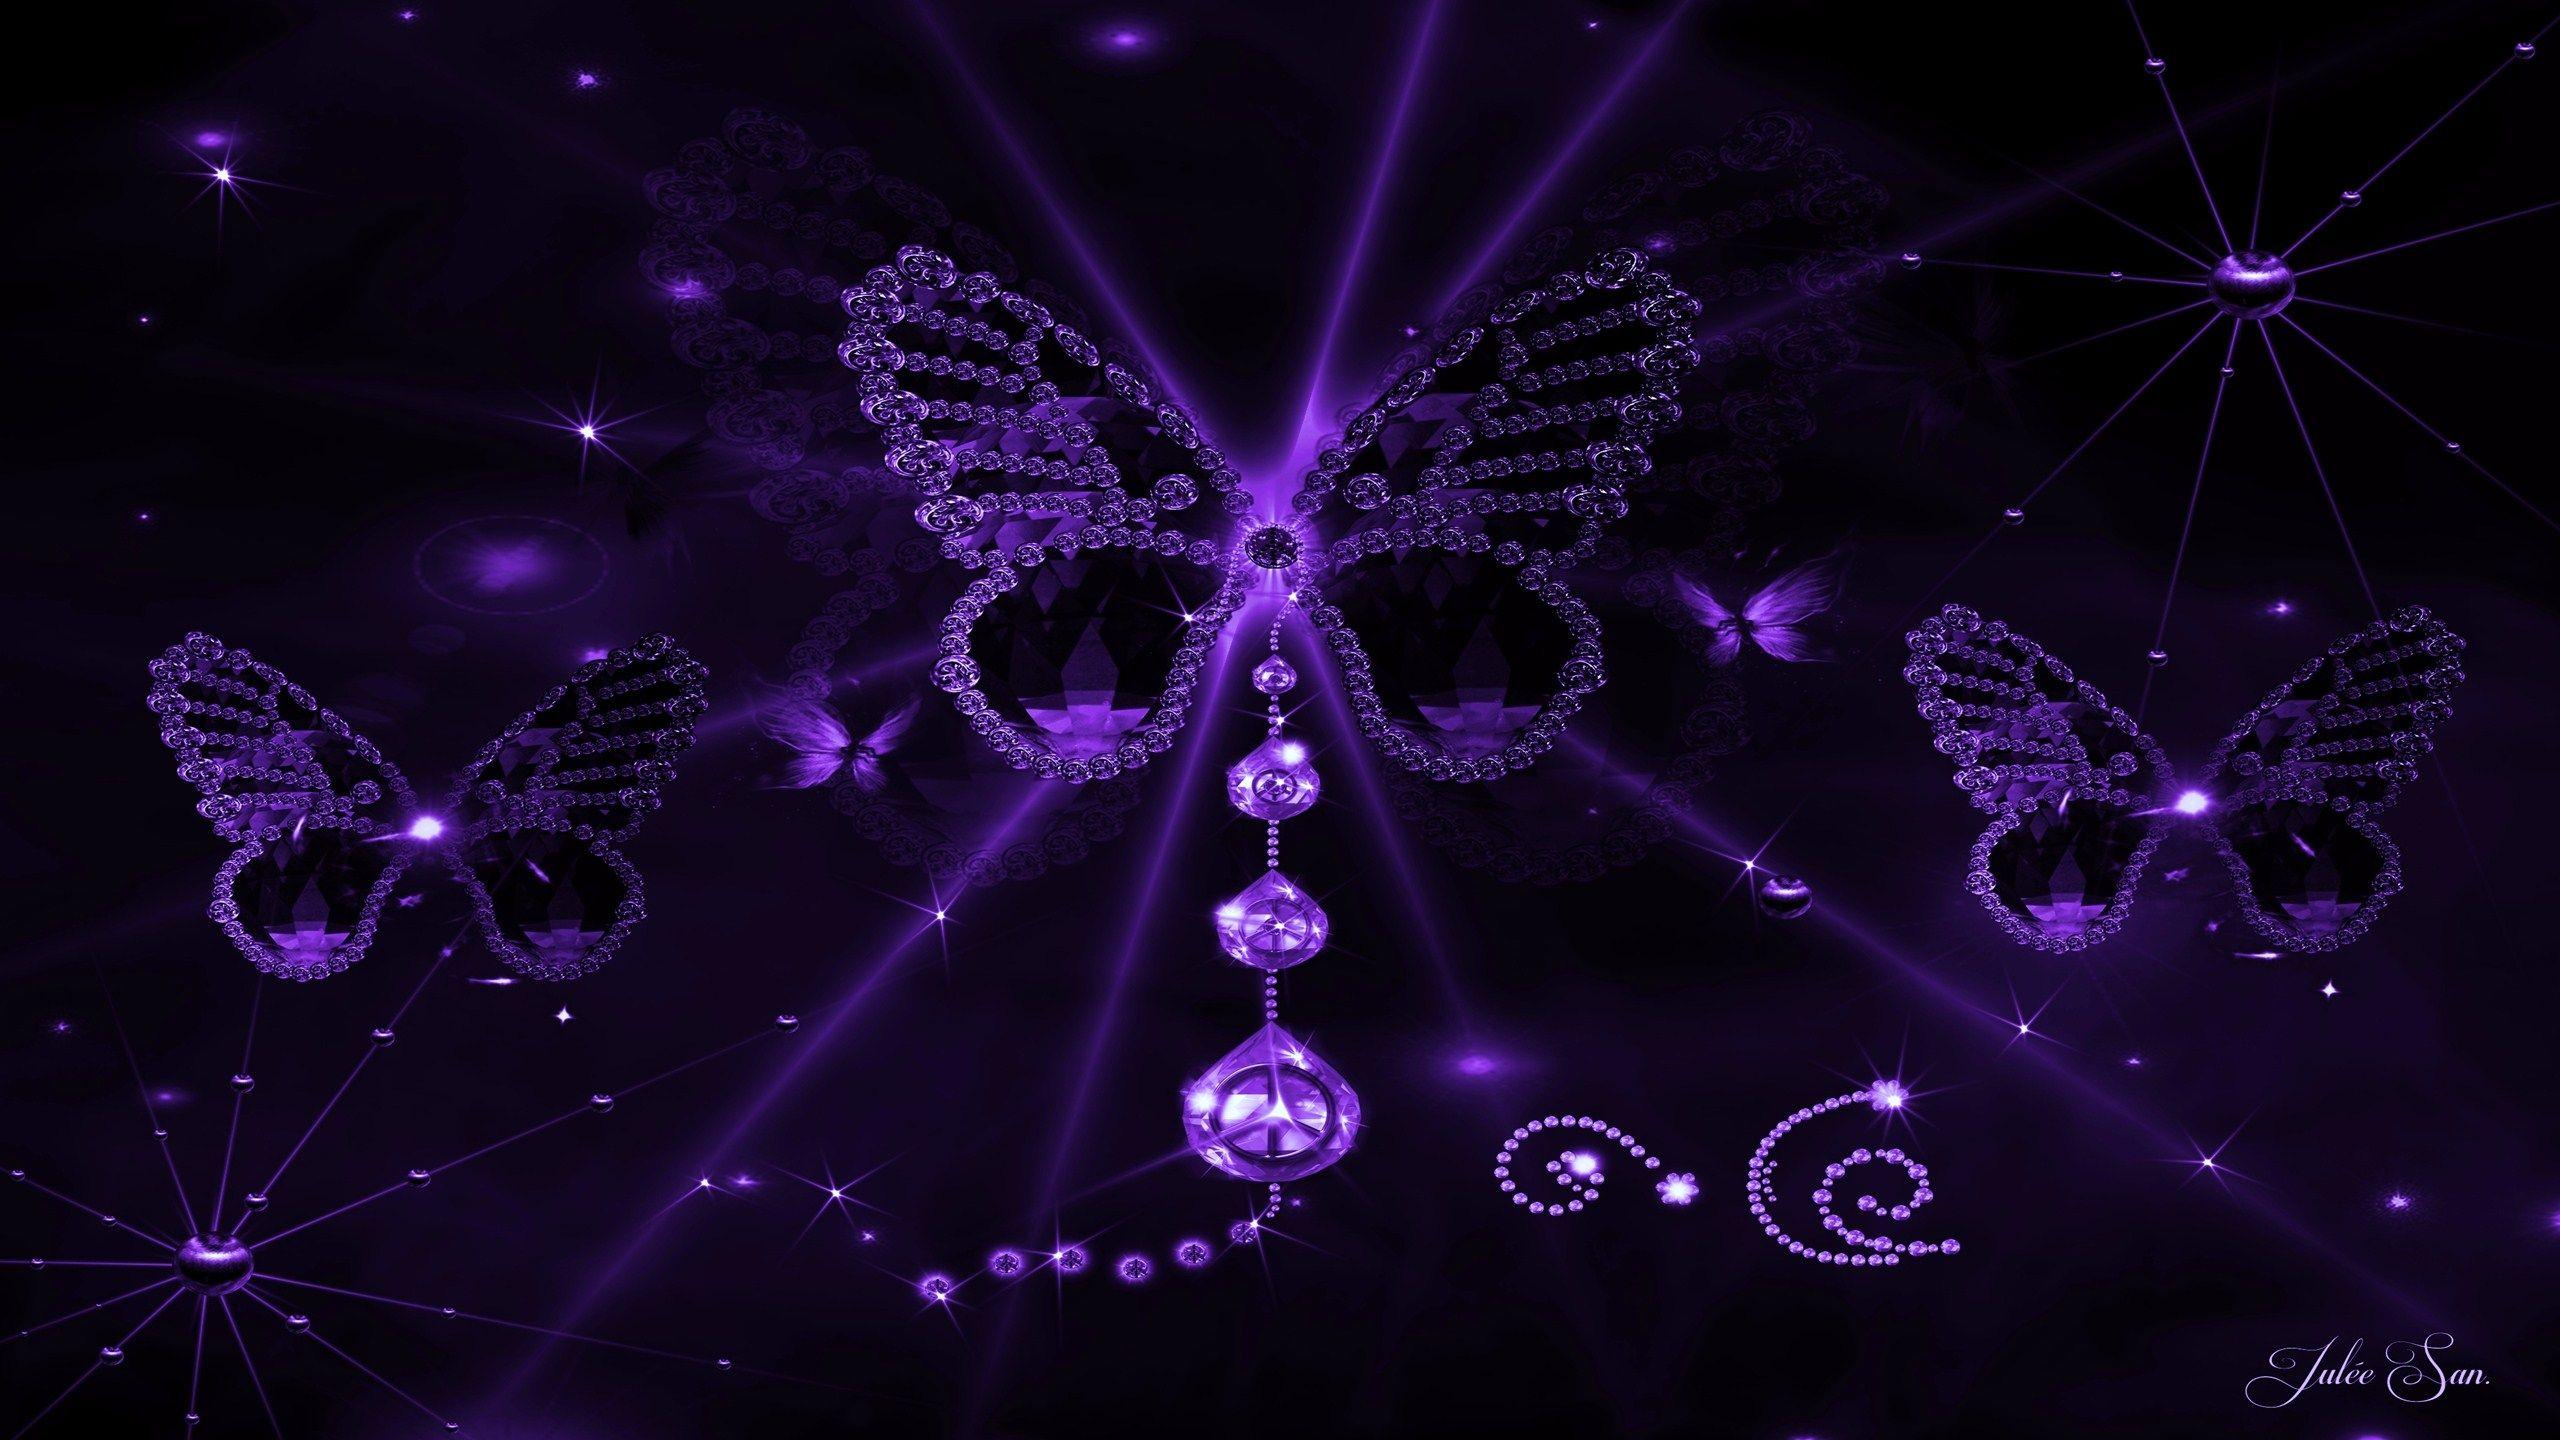 purplebutterflydesktopbackground589943.jpg (2560×1440